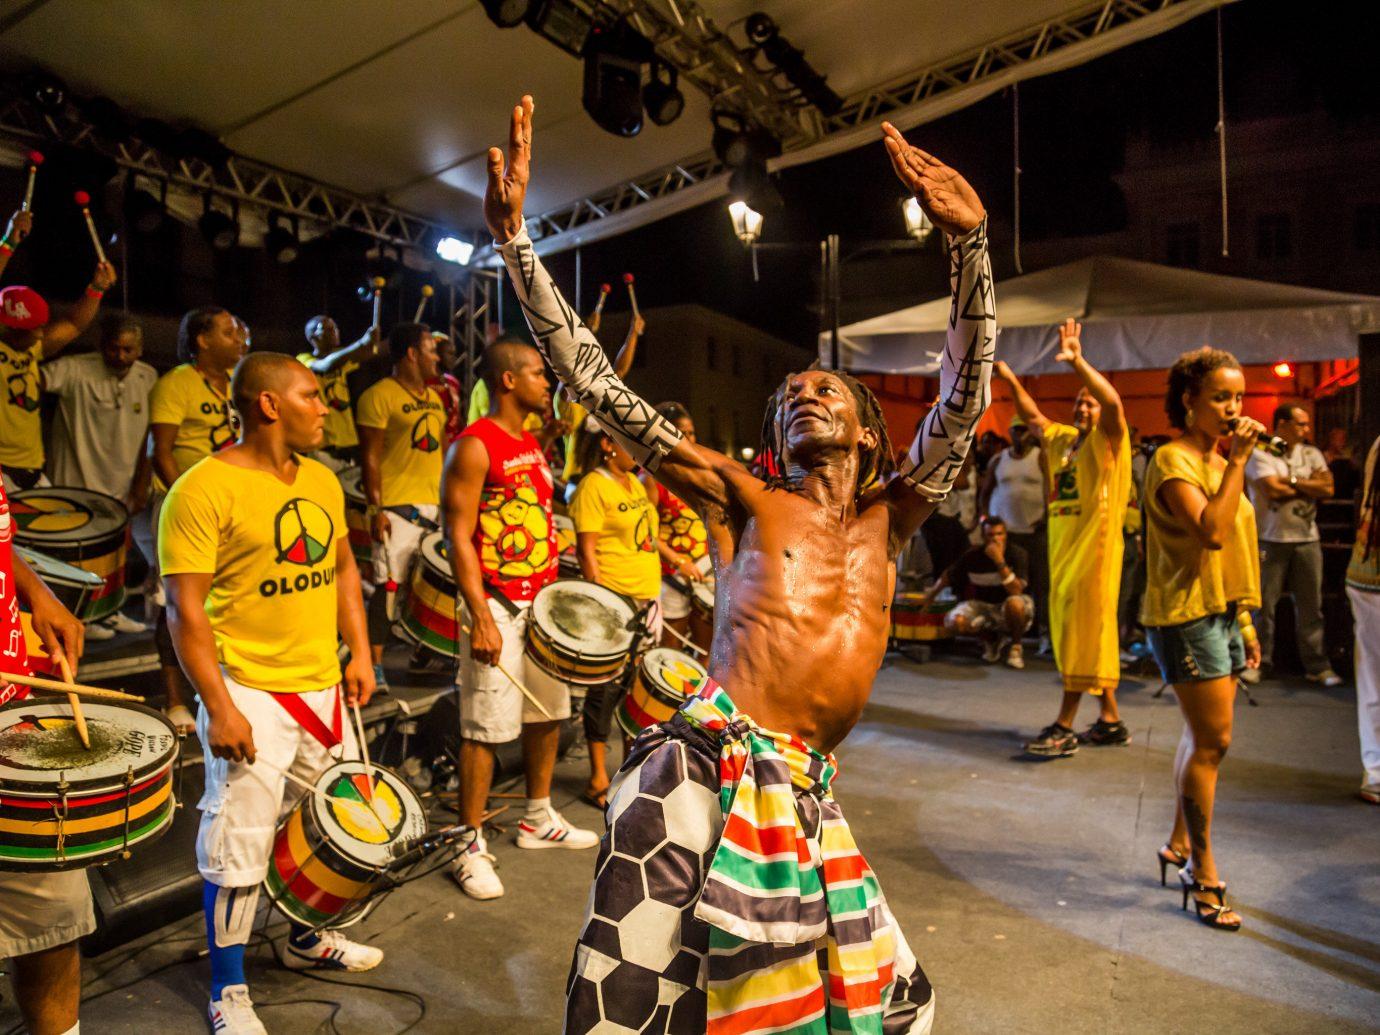 Beaches Brazil Trip Ideas person crowd carnival performance art Sport event festival people dance